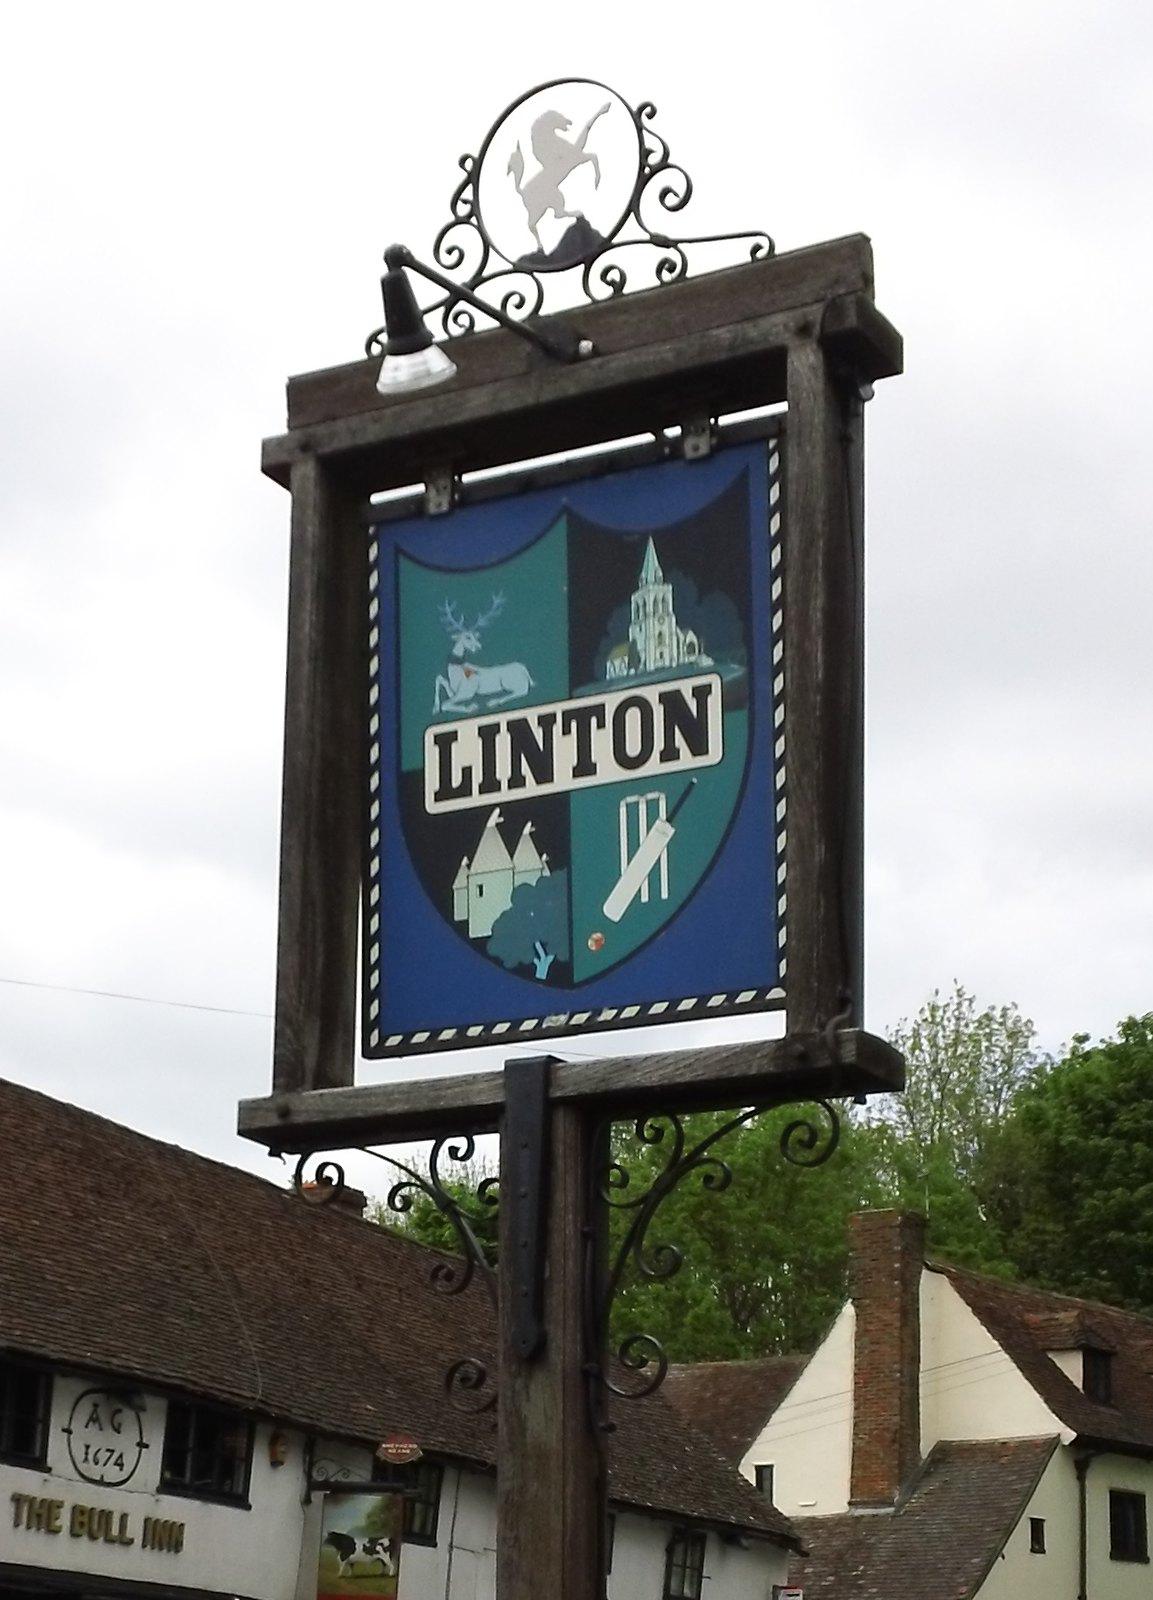 Linton Kent